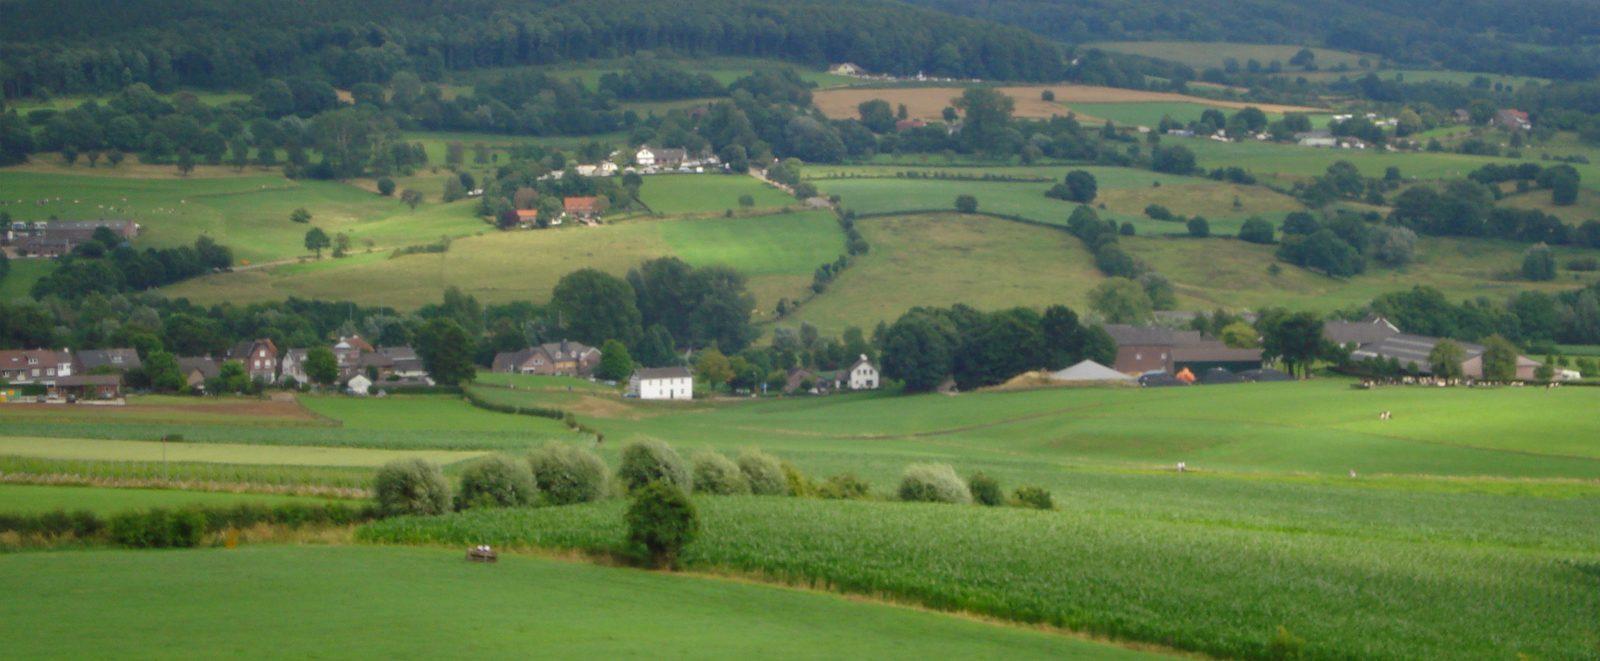 Provinz Limburg